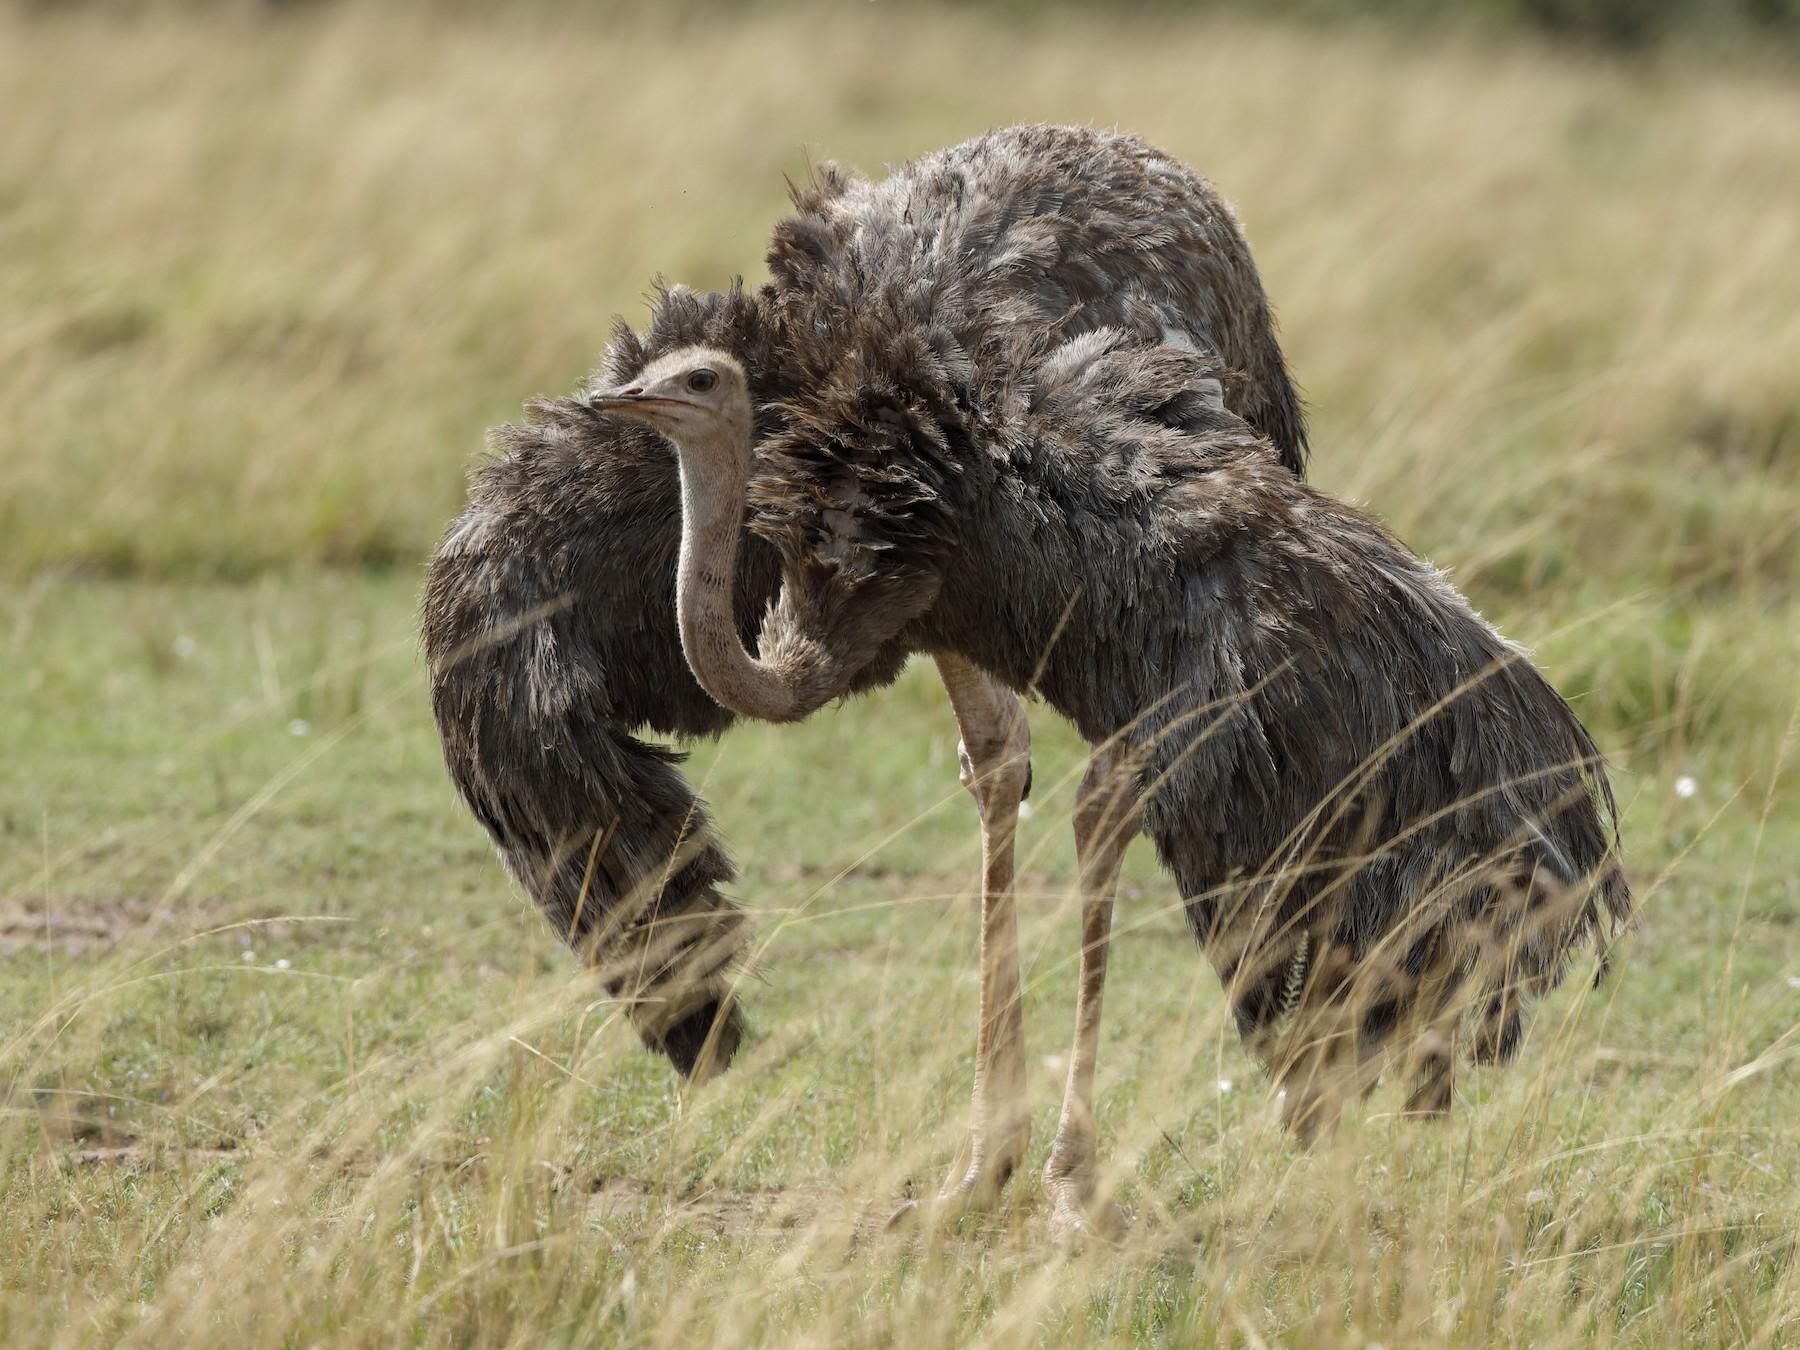 Common Ostrich - Holger Teichmann